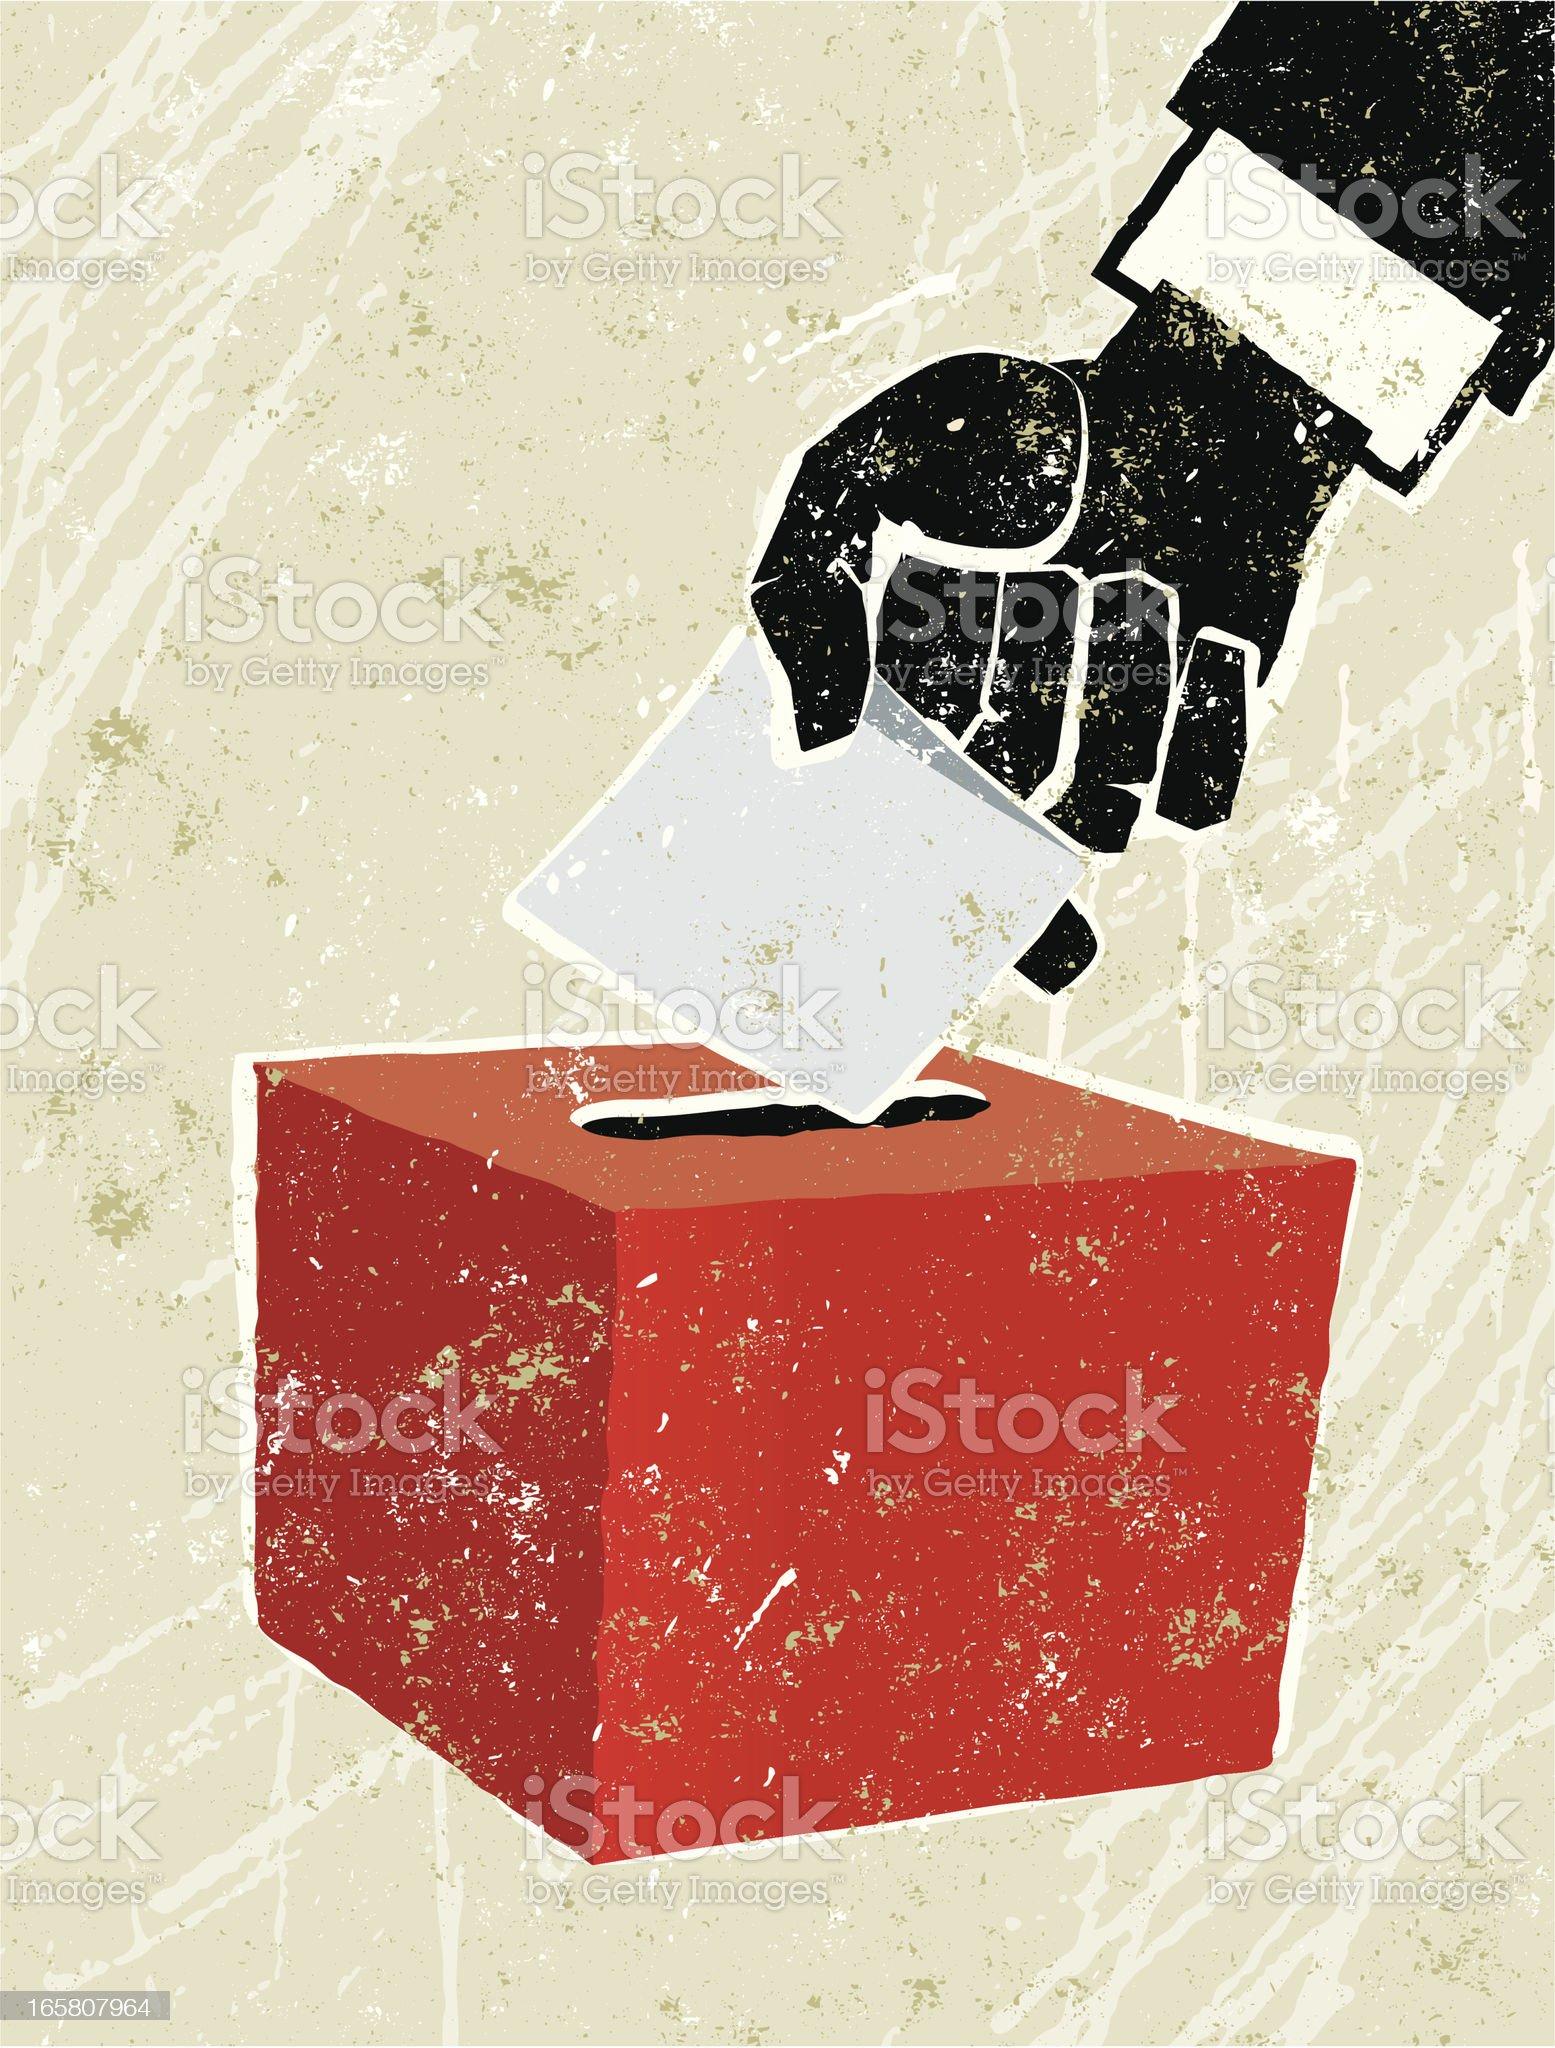 Voting at the Ballot Box royalty-free stock vector art